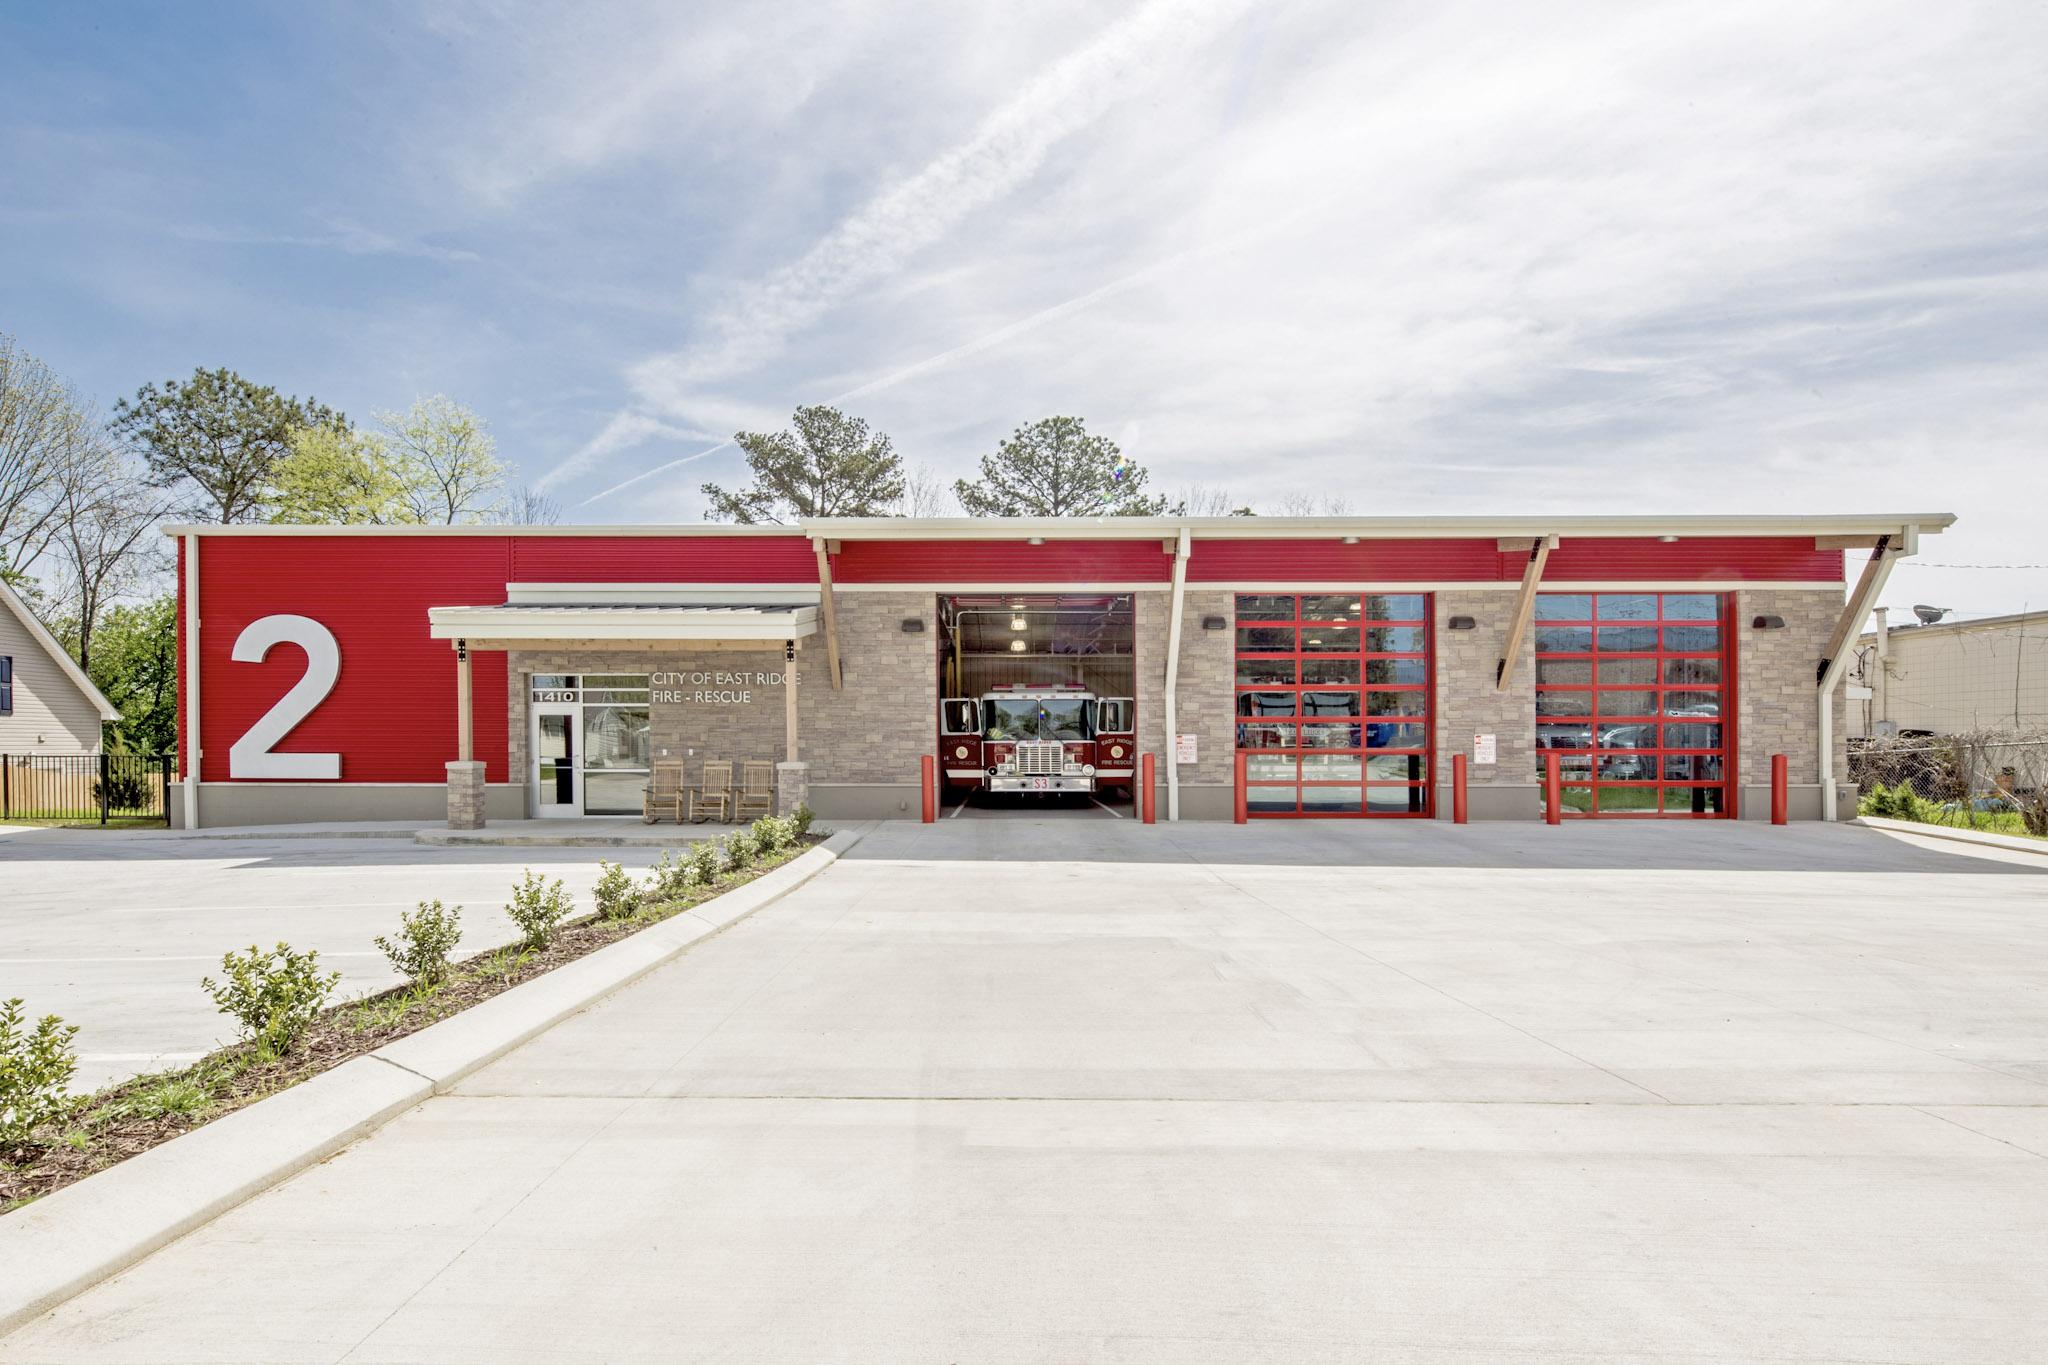 East Ridge Fire Hall